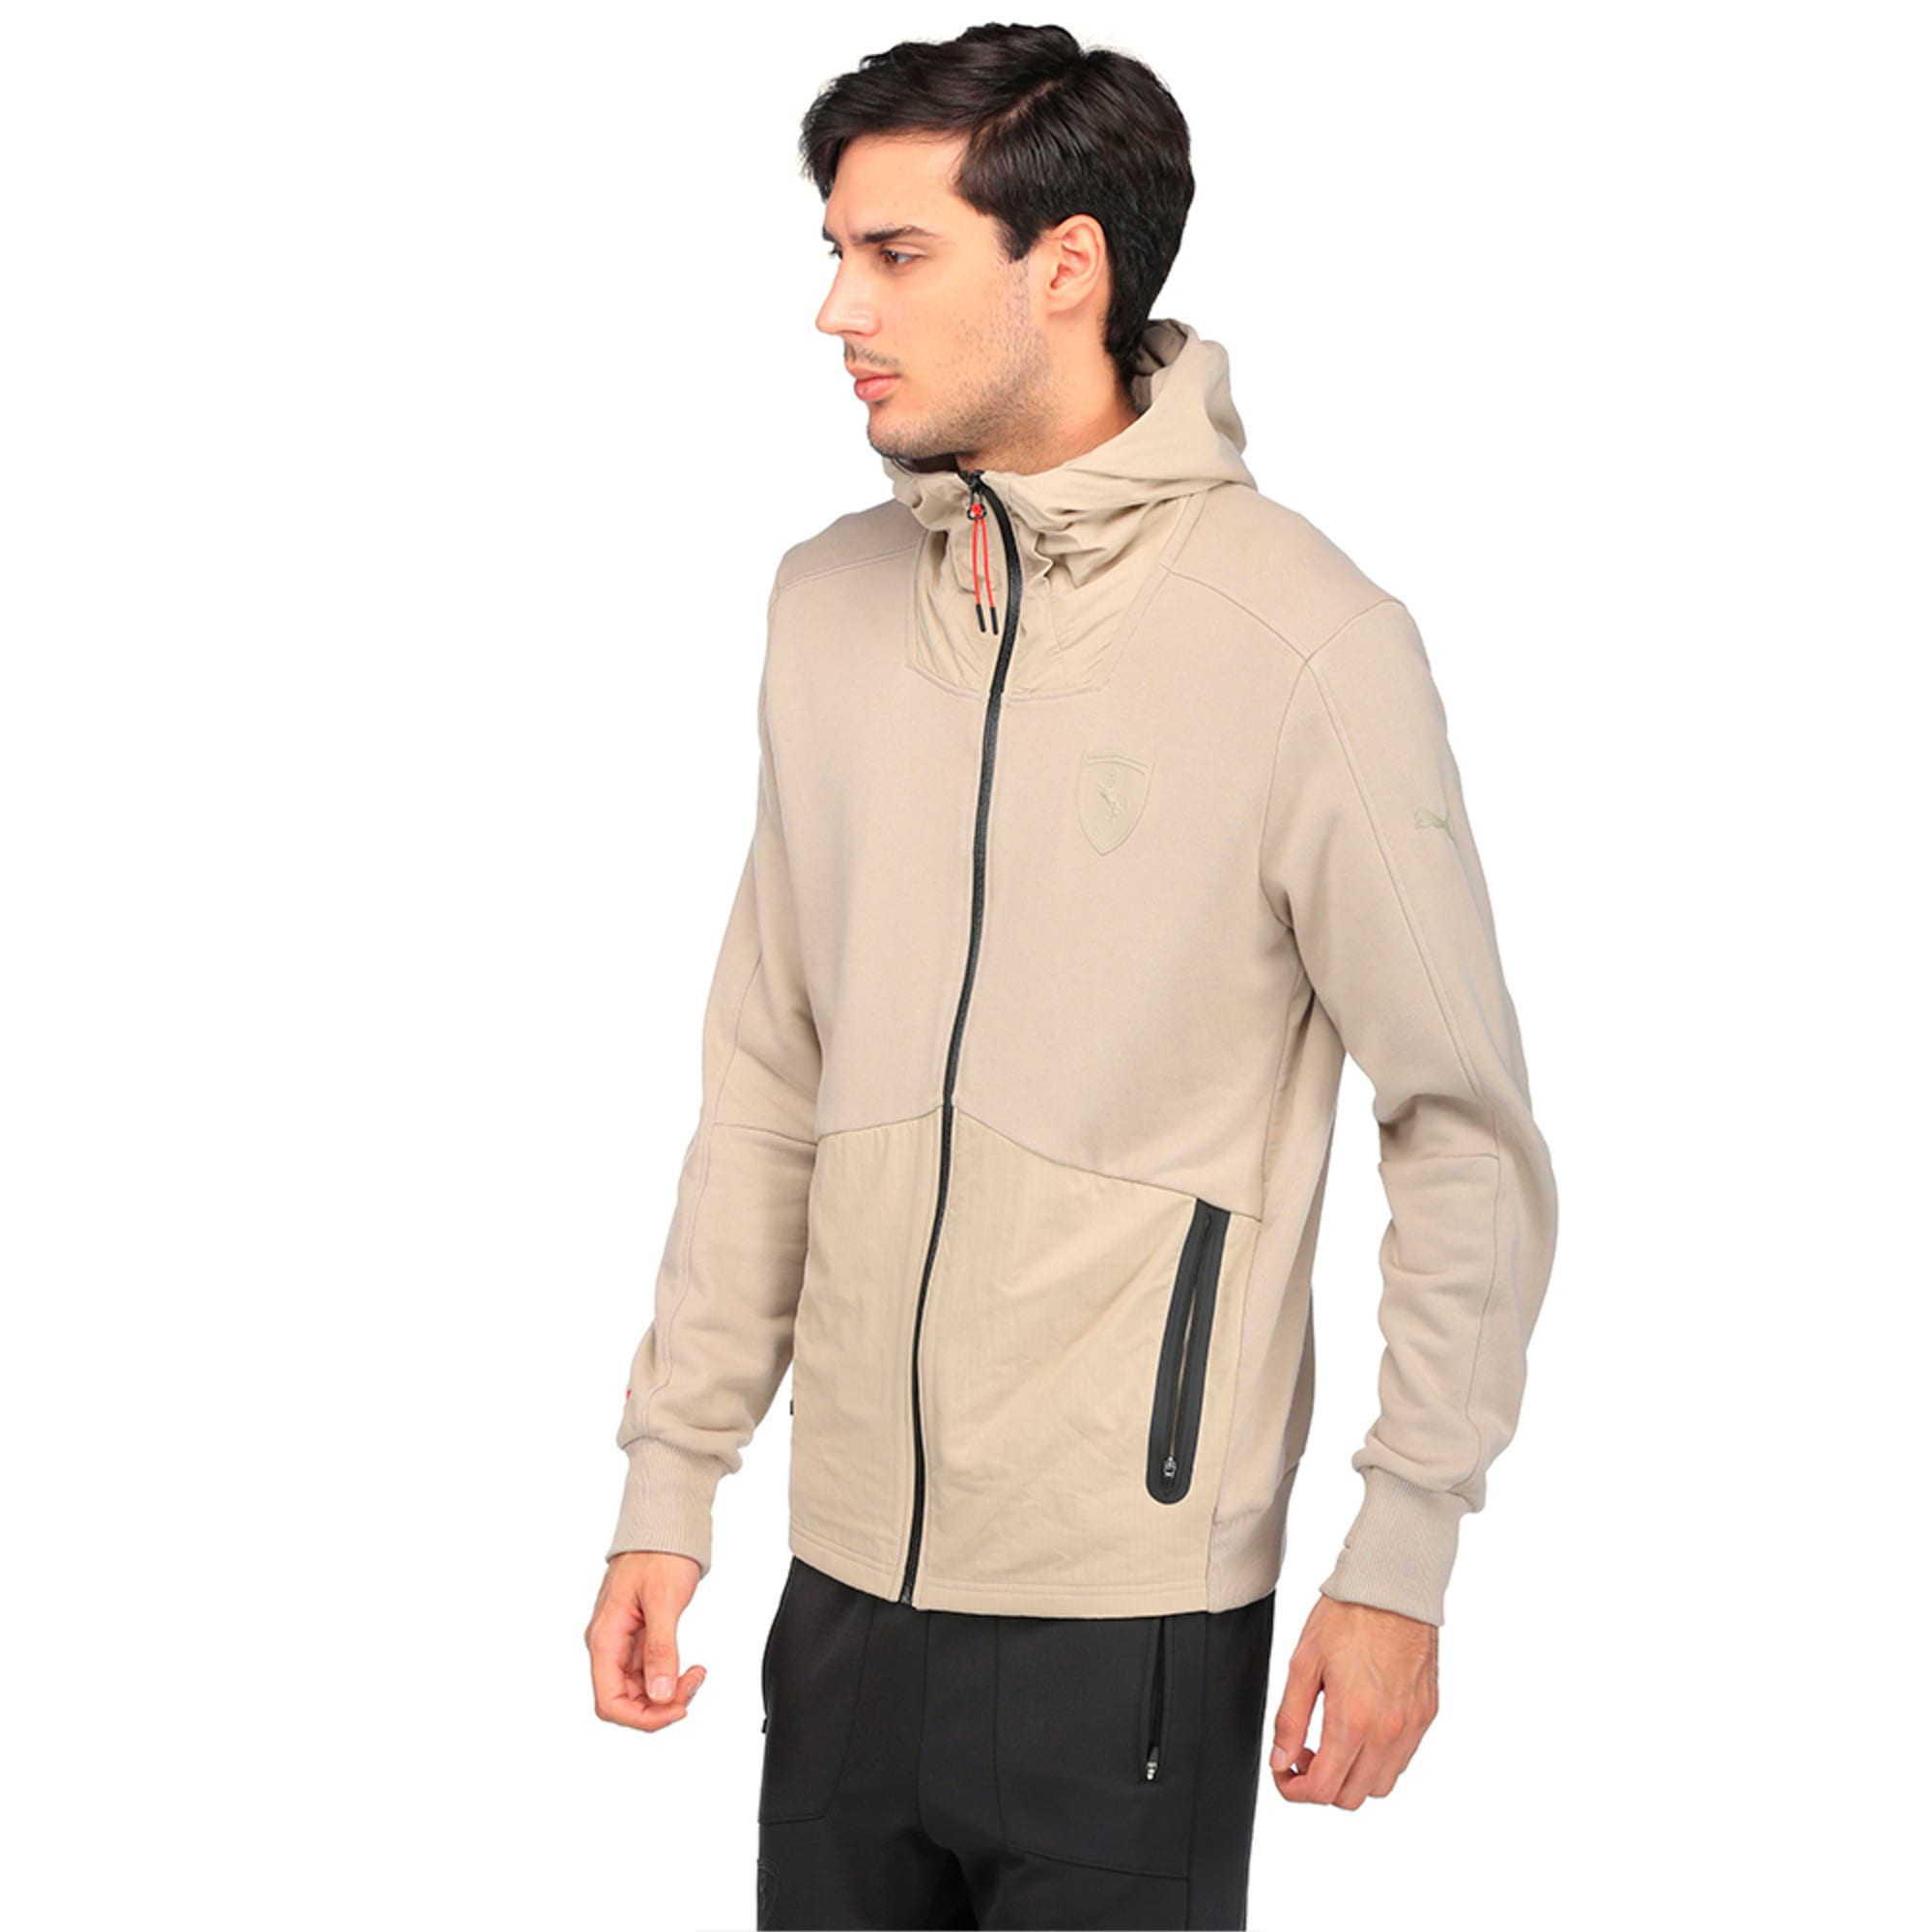 Thumbnail 5 of Ferrari Lifestyle Men's Hooded Sweat Jacket, Pure Cashmere, medium-IND